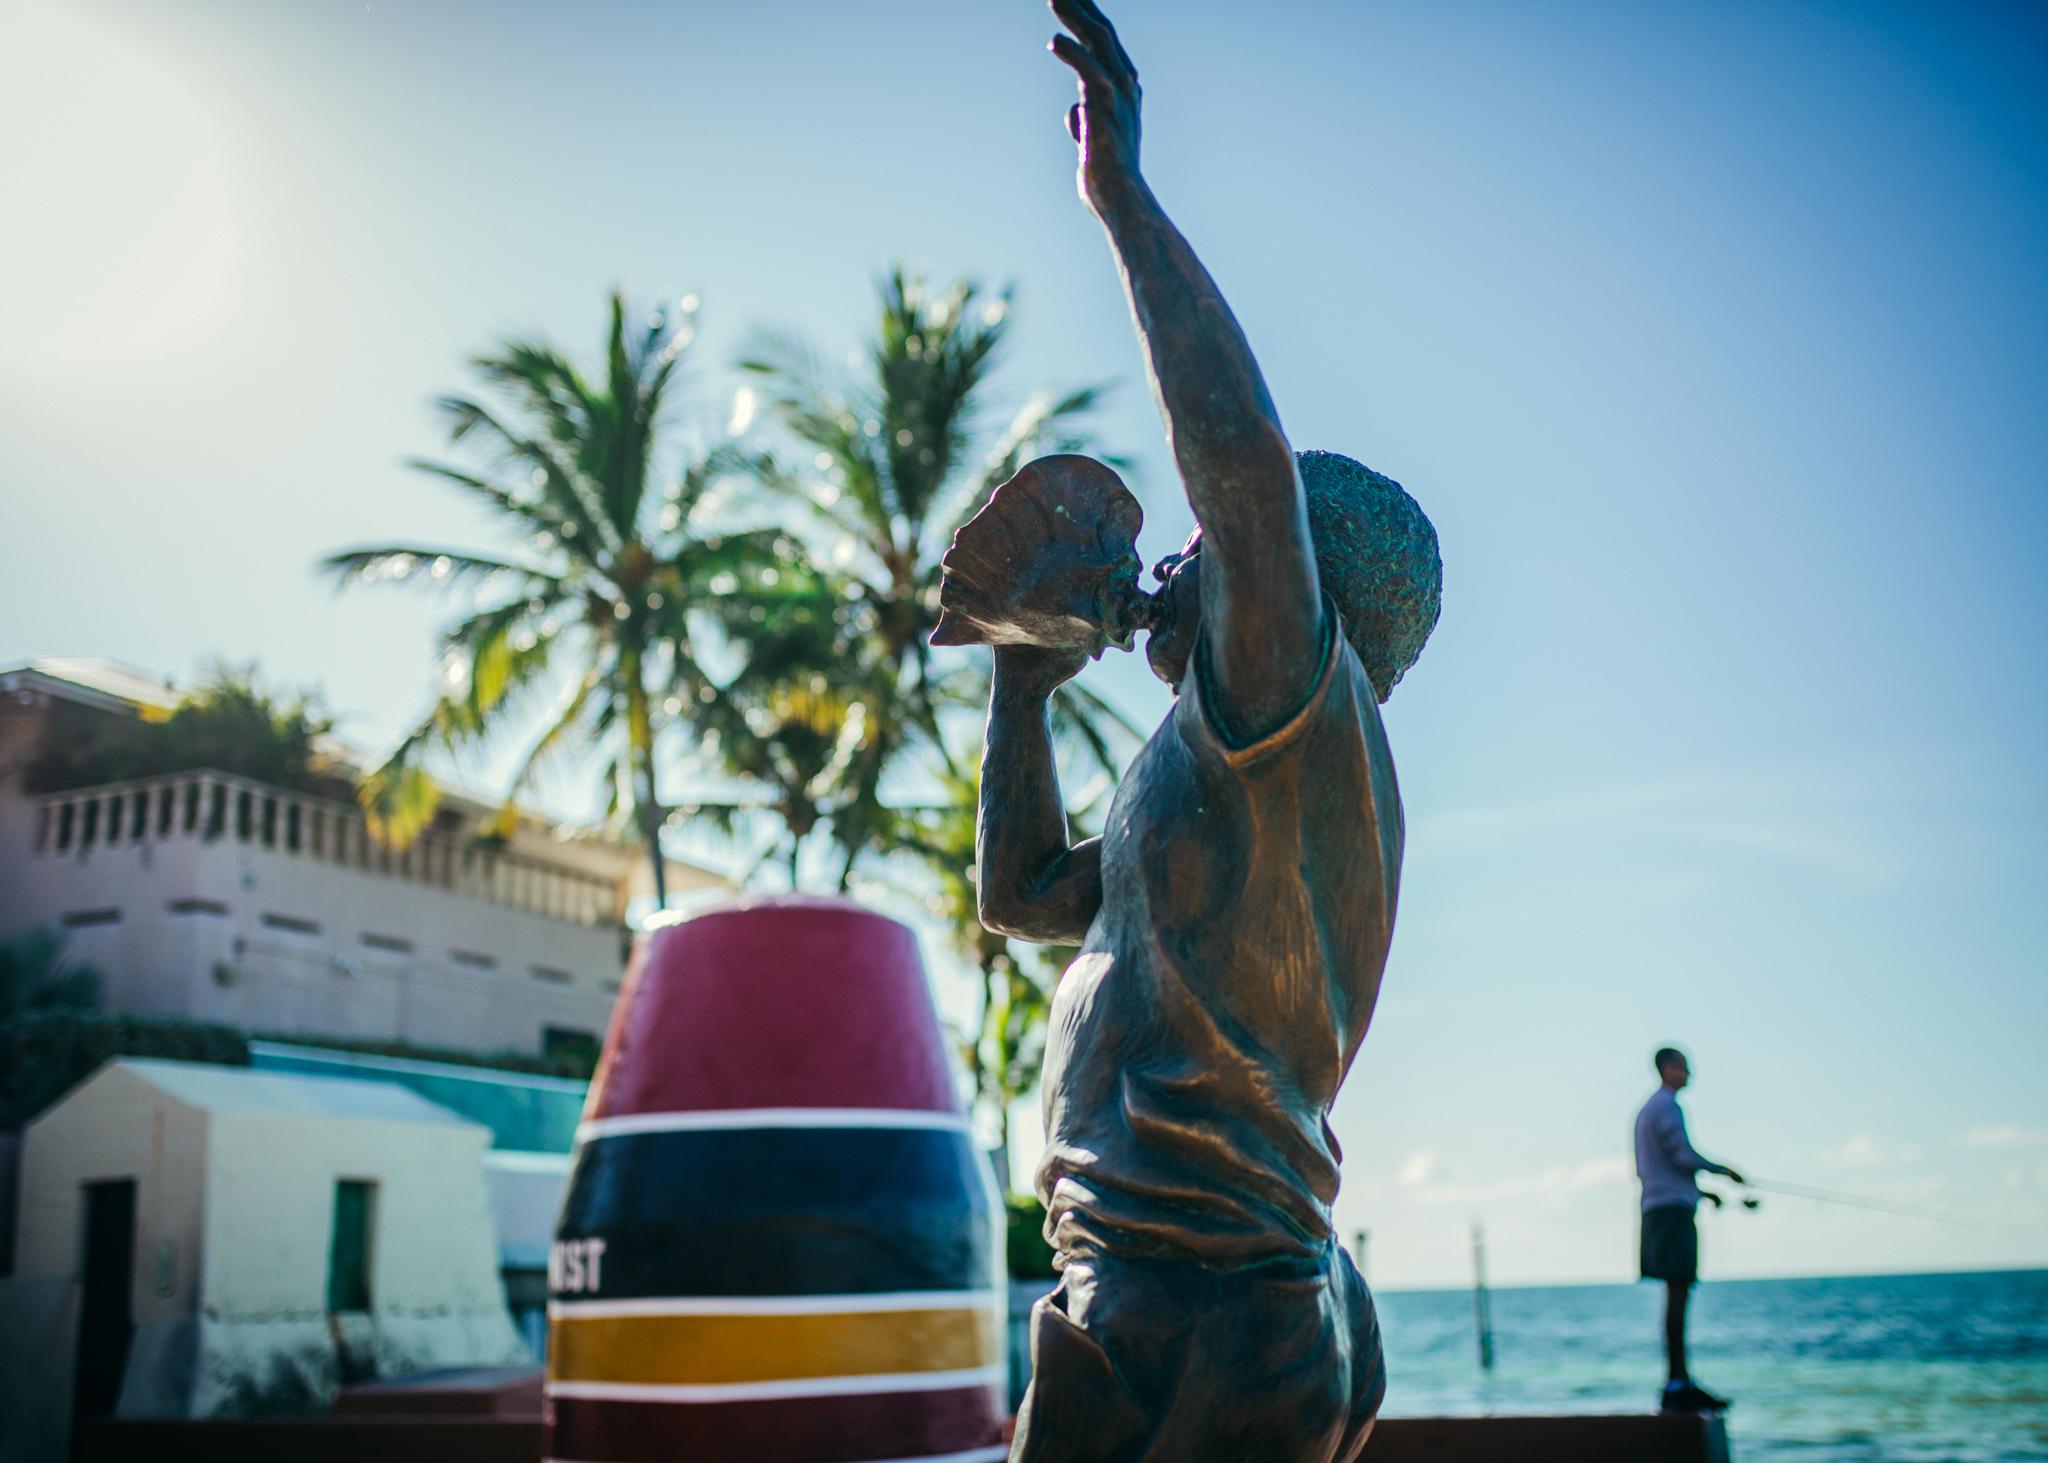 key west higgs beach, visit florida, key west photographer, lena perkins, white street, bicycle, southernmost point, cayo hueso, island, tropics, casa marina, hemingway home